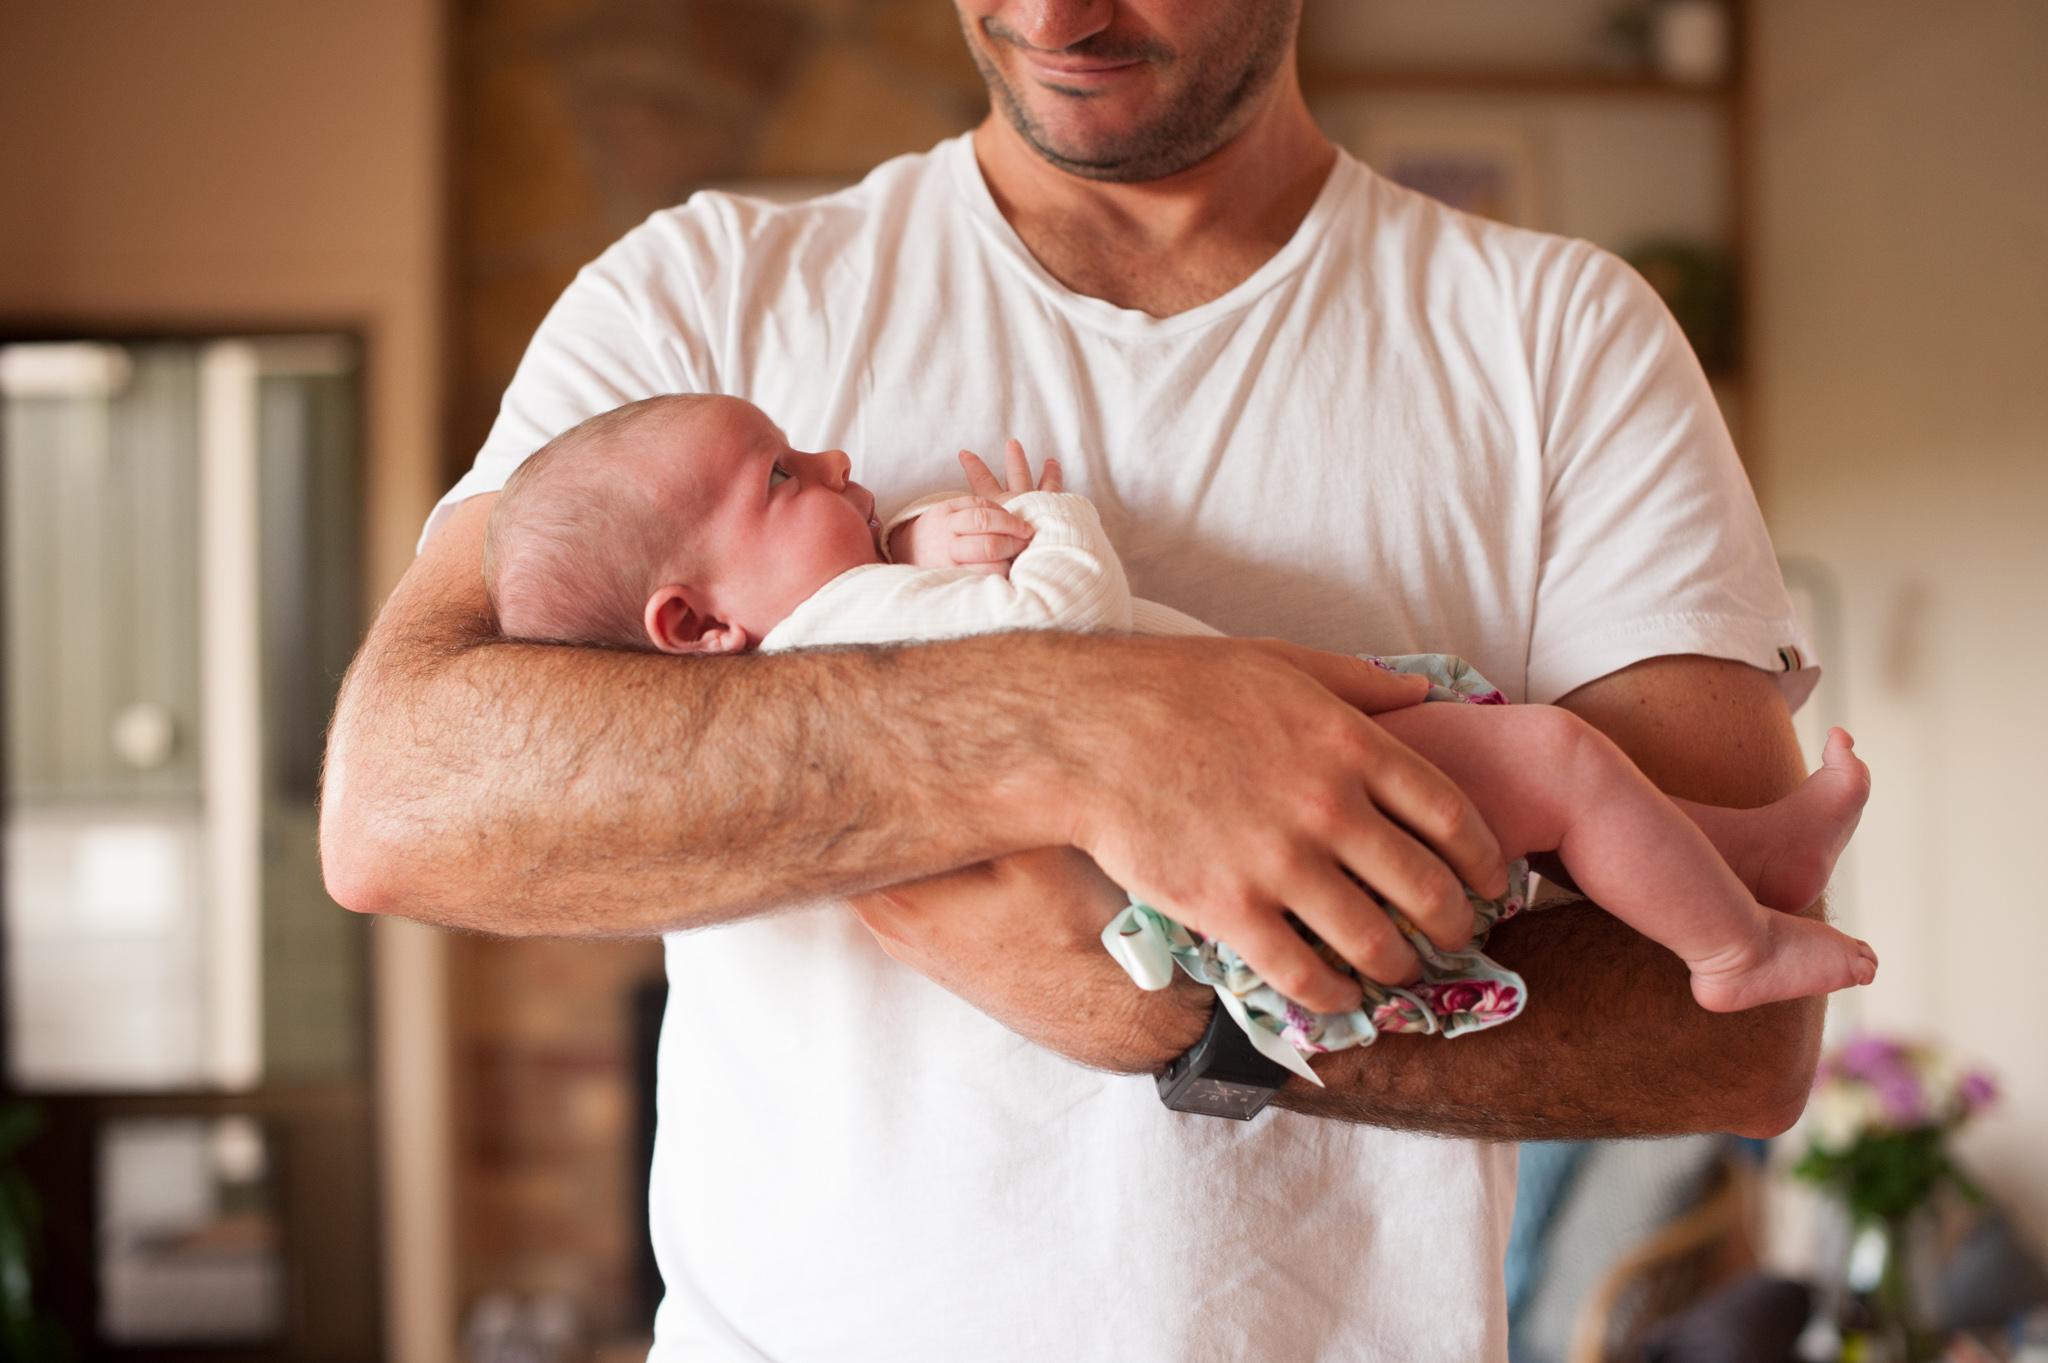 newborn baby cuddled up with daddy